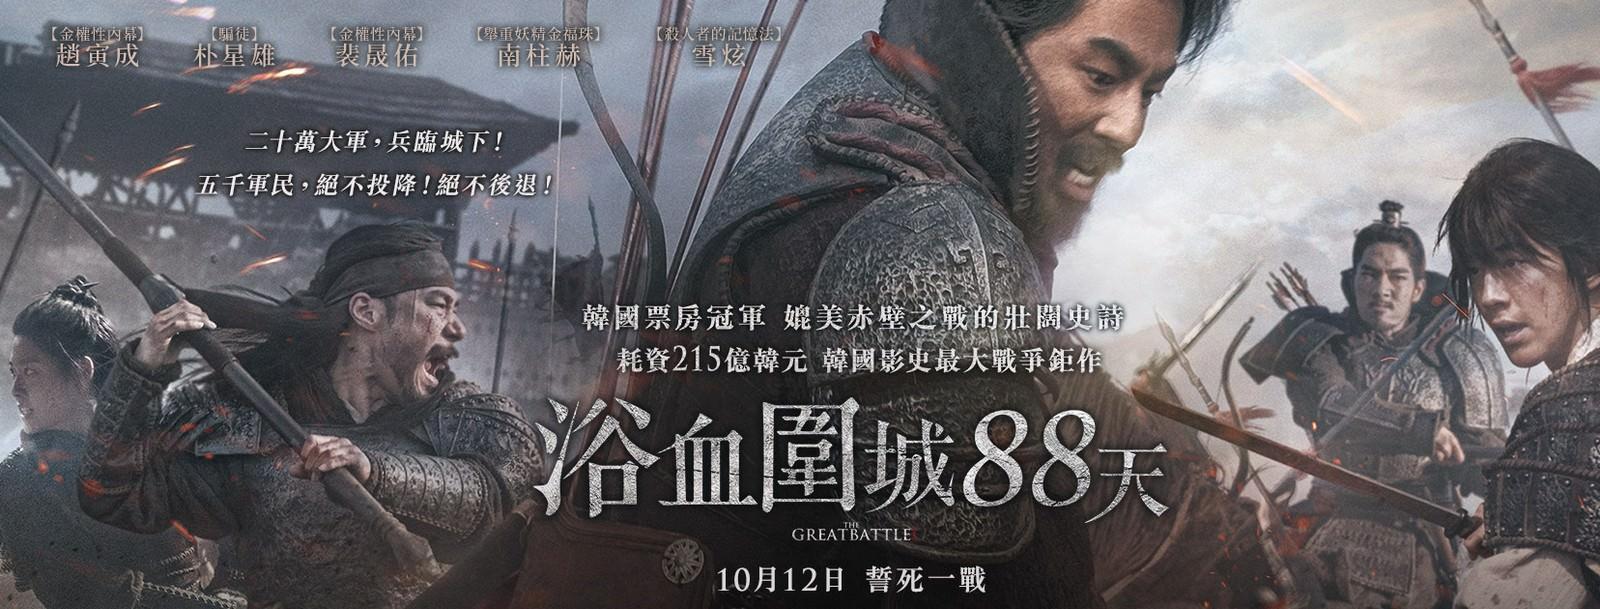 Movie, 안시성(韓國, 2018) / 浴血圍城88天(台灣) / 安市城(香港) / The Great Battle(英文), 電影海報, 台灣, 橫版